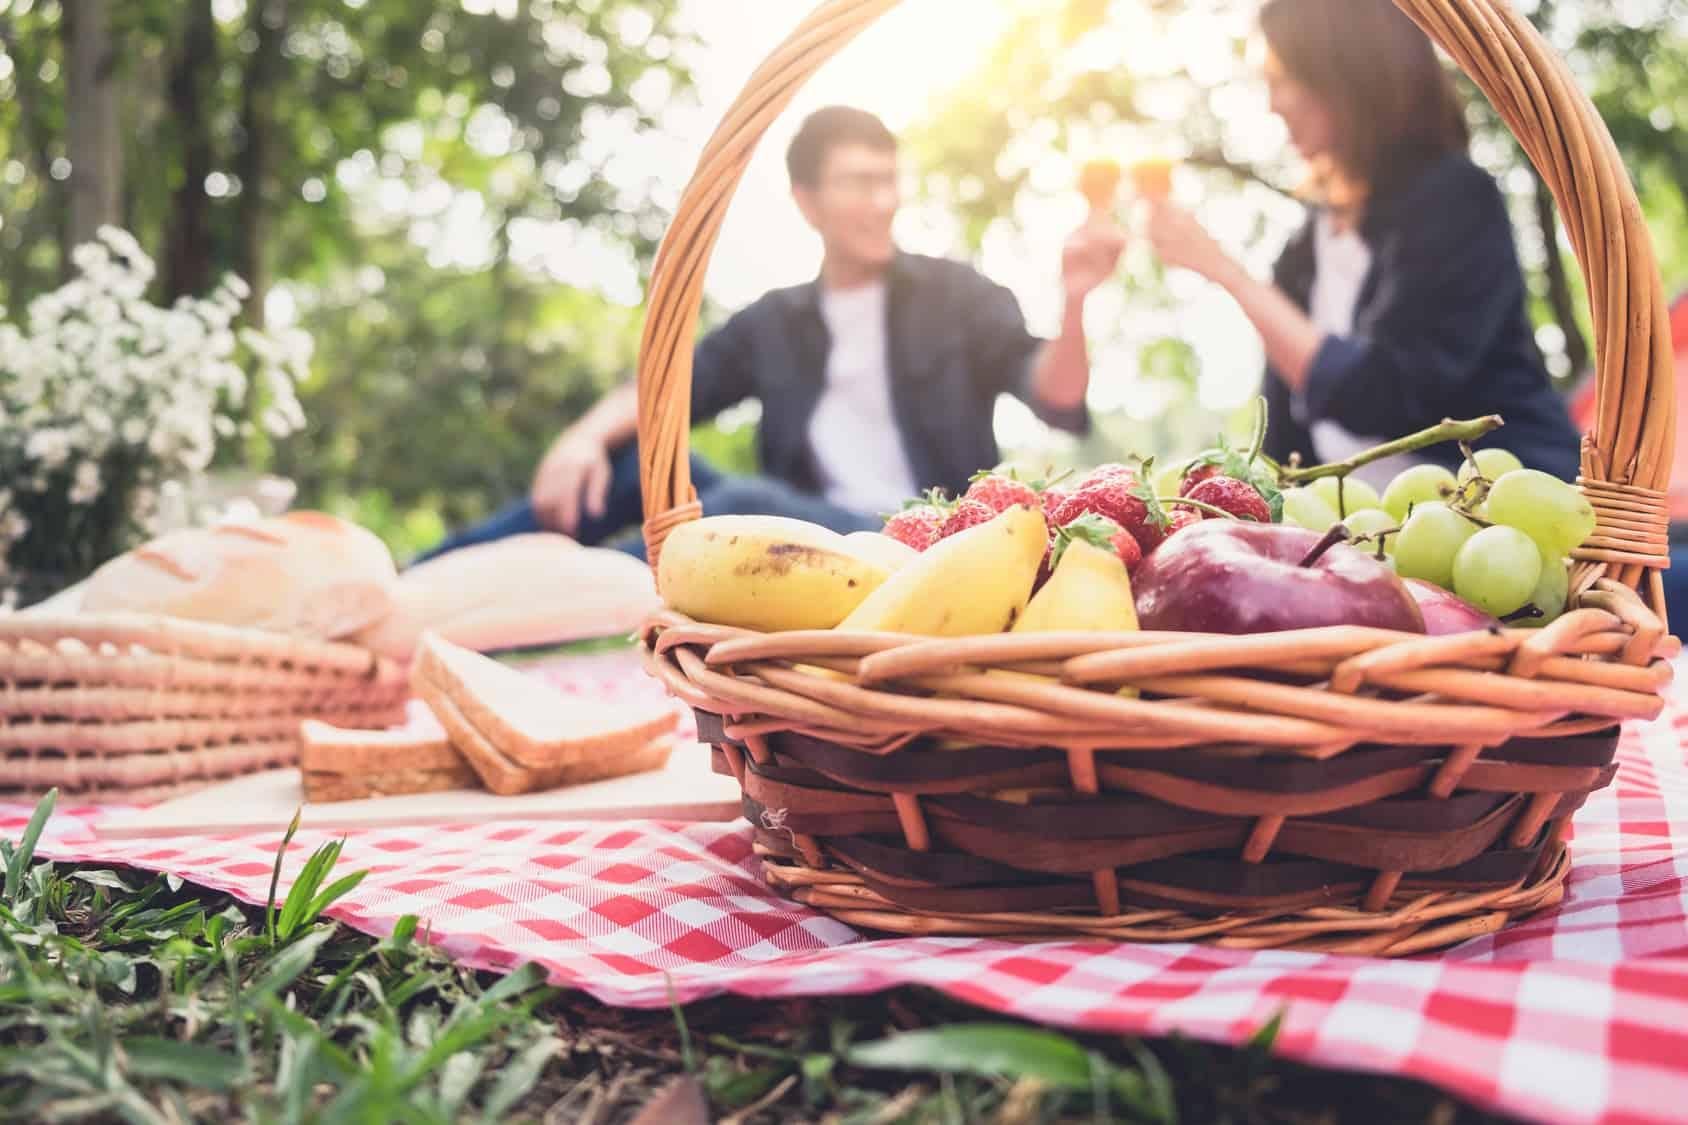 Pareja en picnic